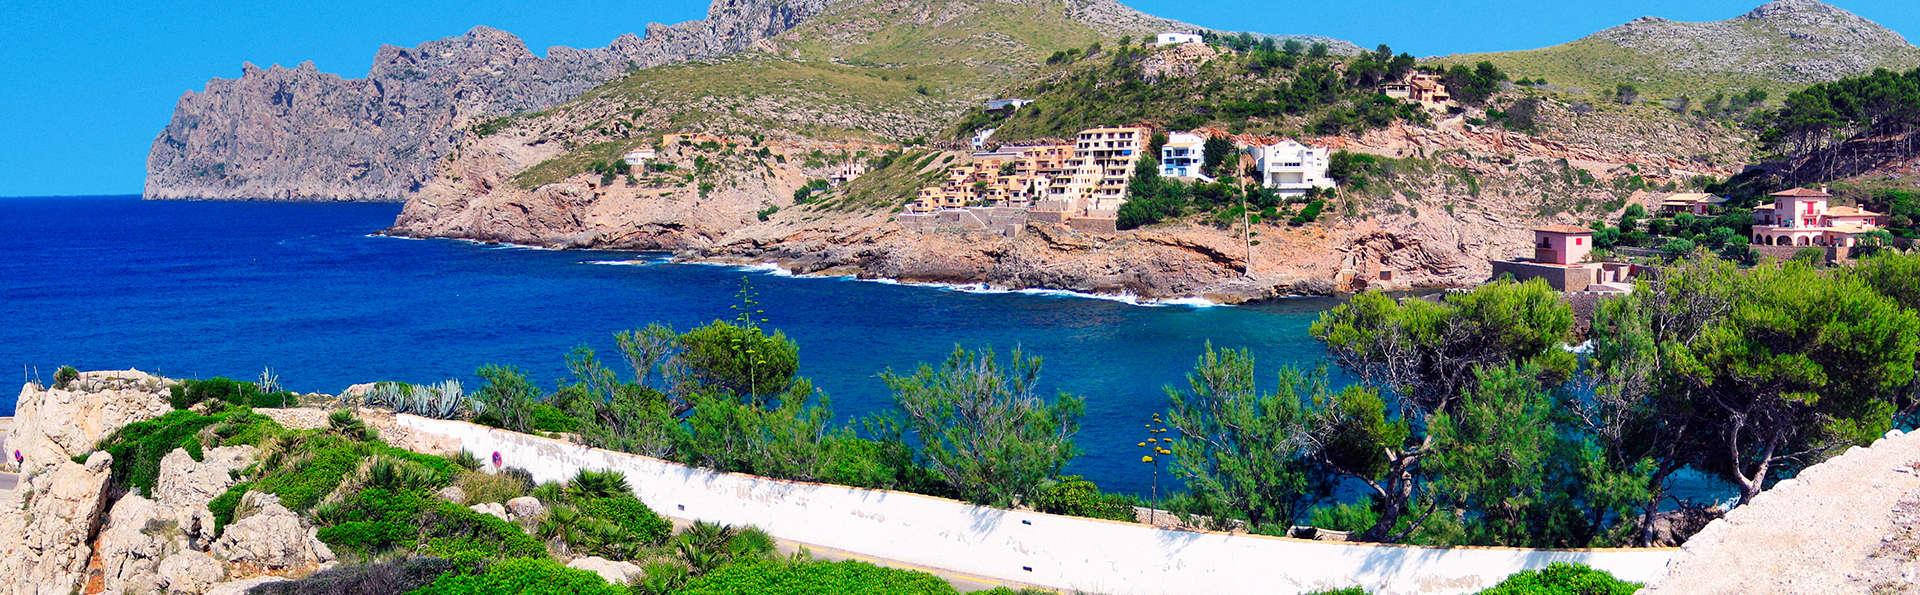 Hotel Son Sant Jordi - EDIT_destination1.jpg